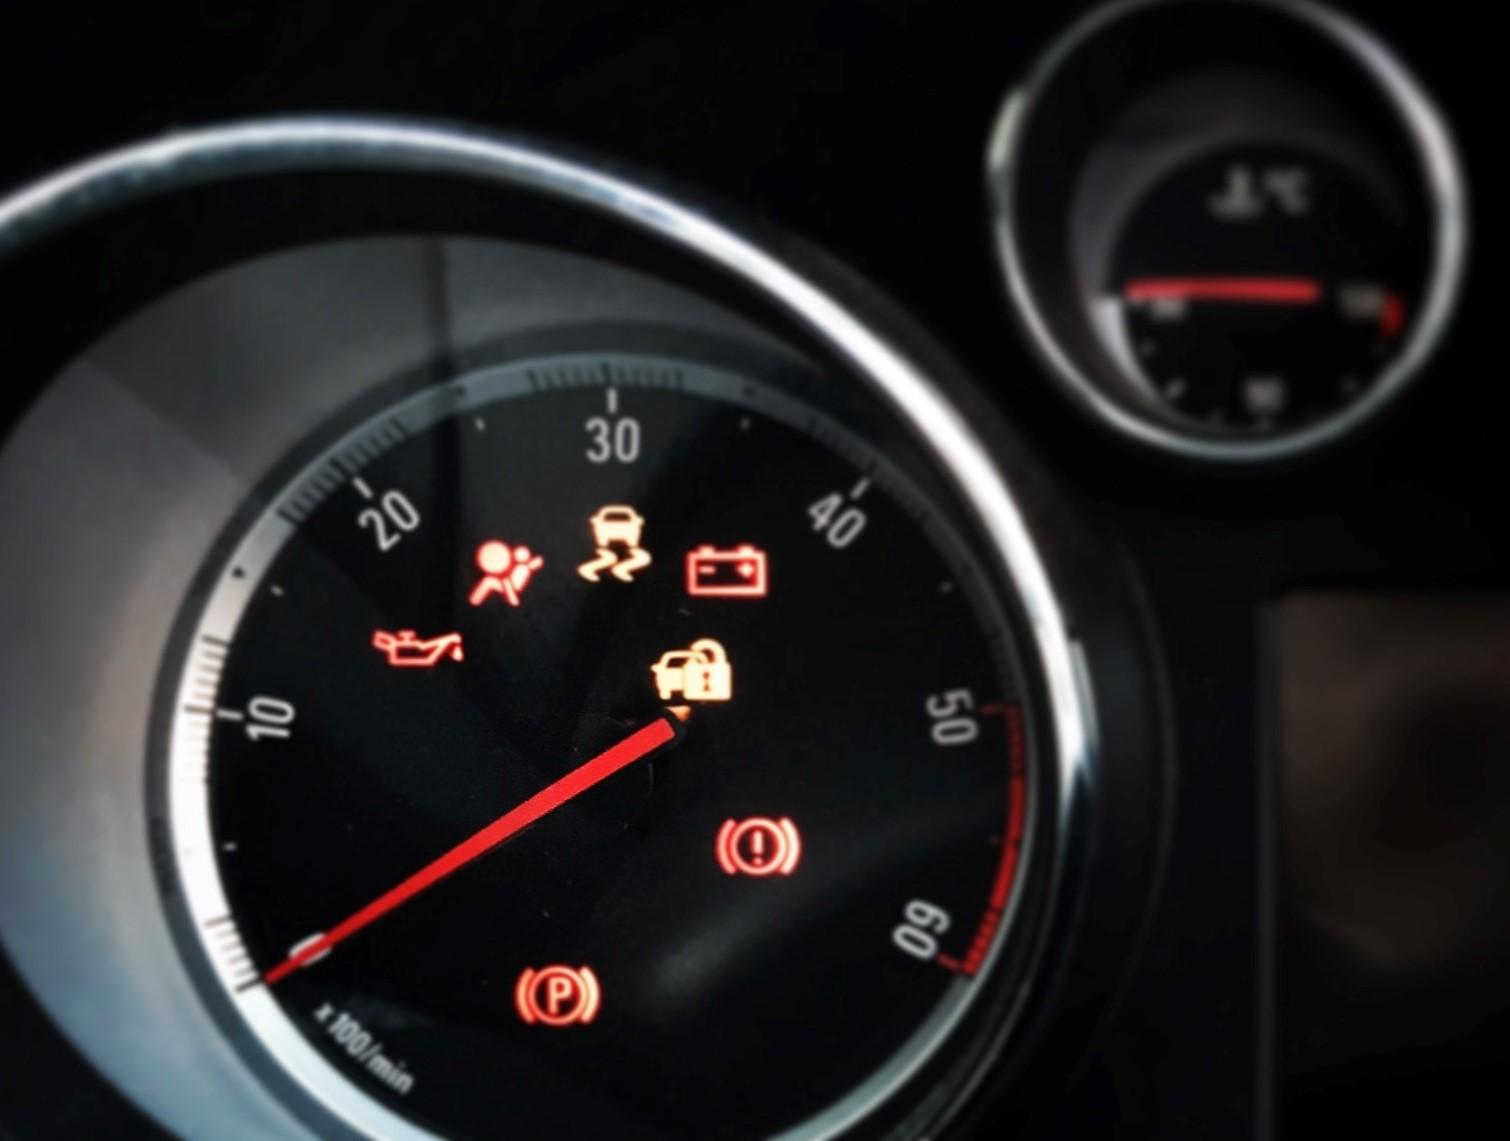 What Do My Car Dashboard Warning Lights Mean